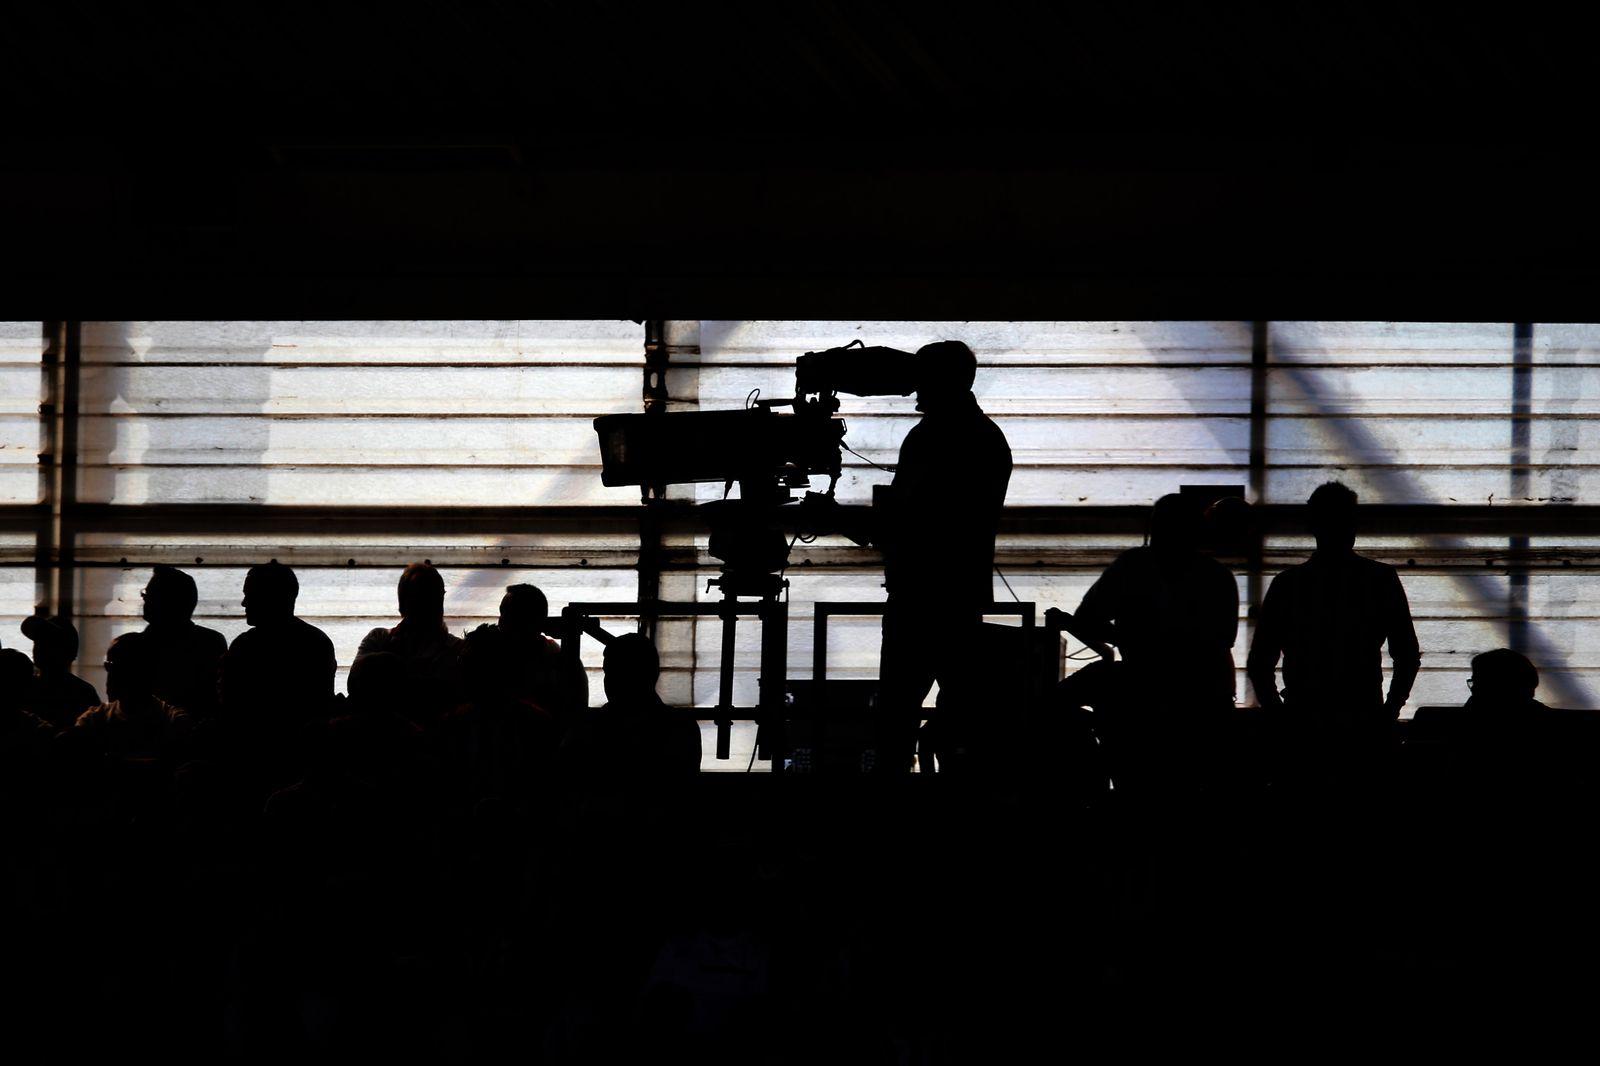 TV/ Kameramann/ Crew